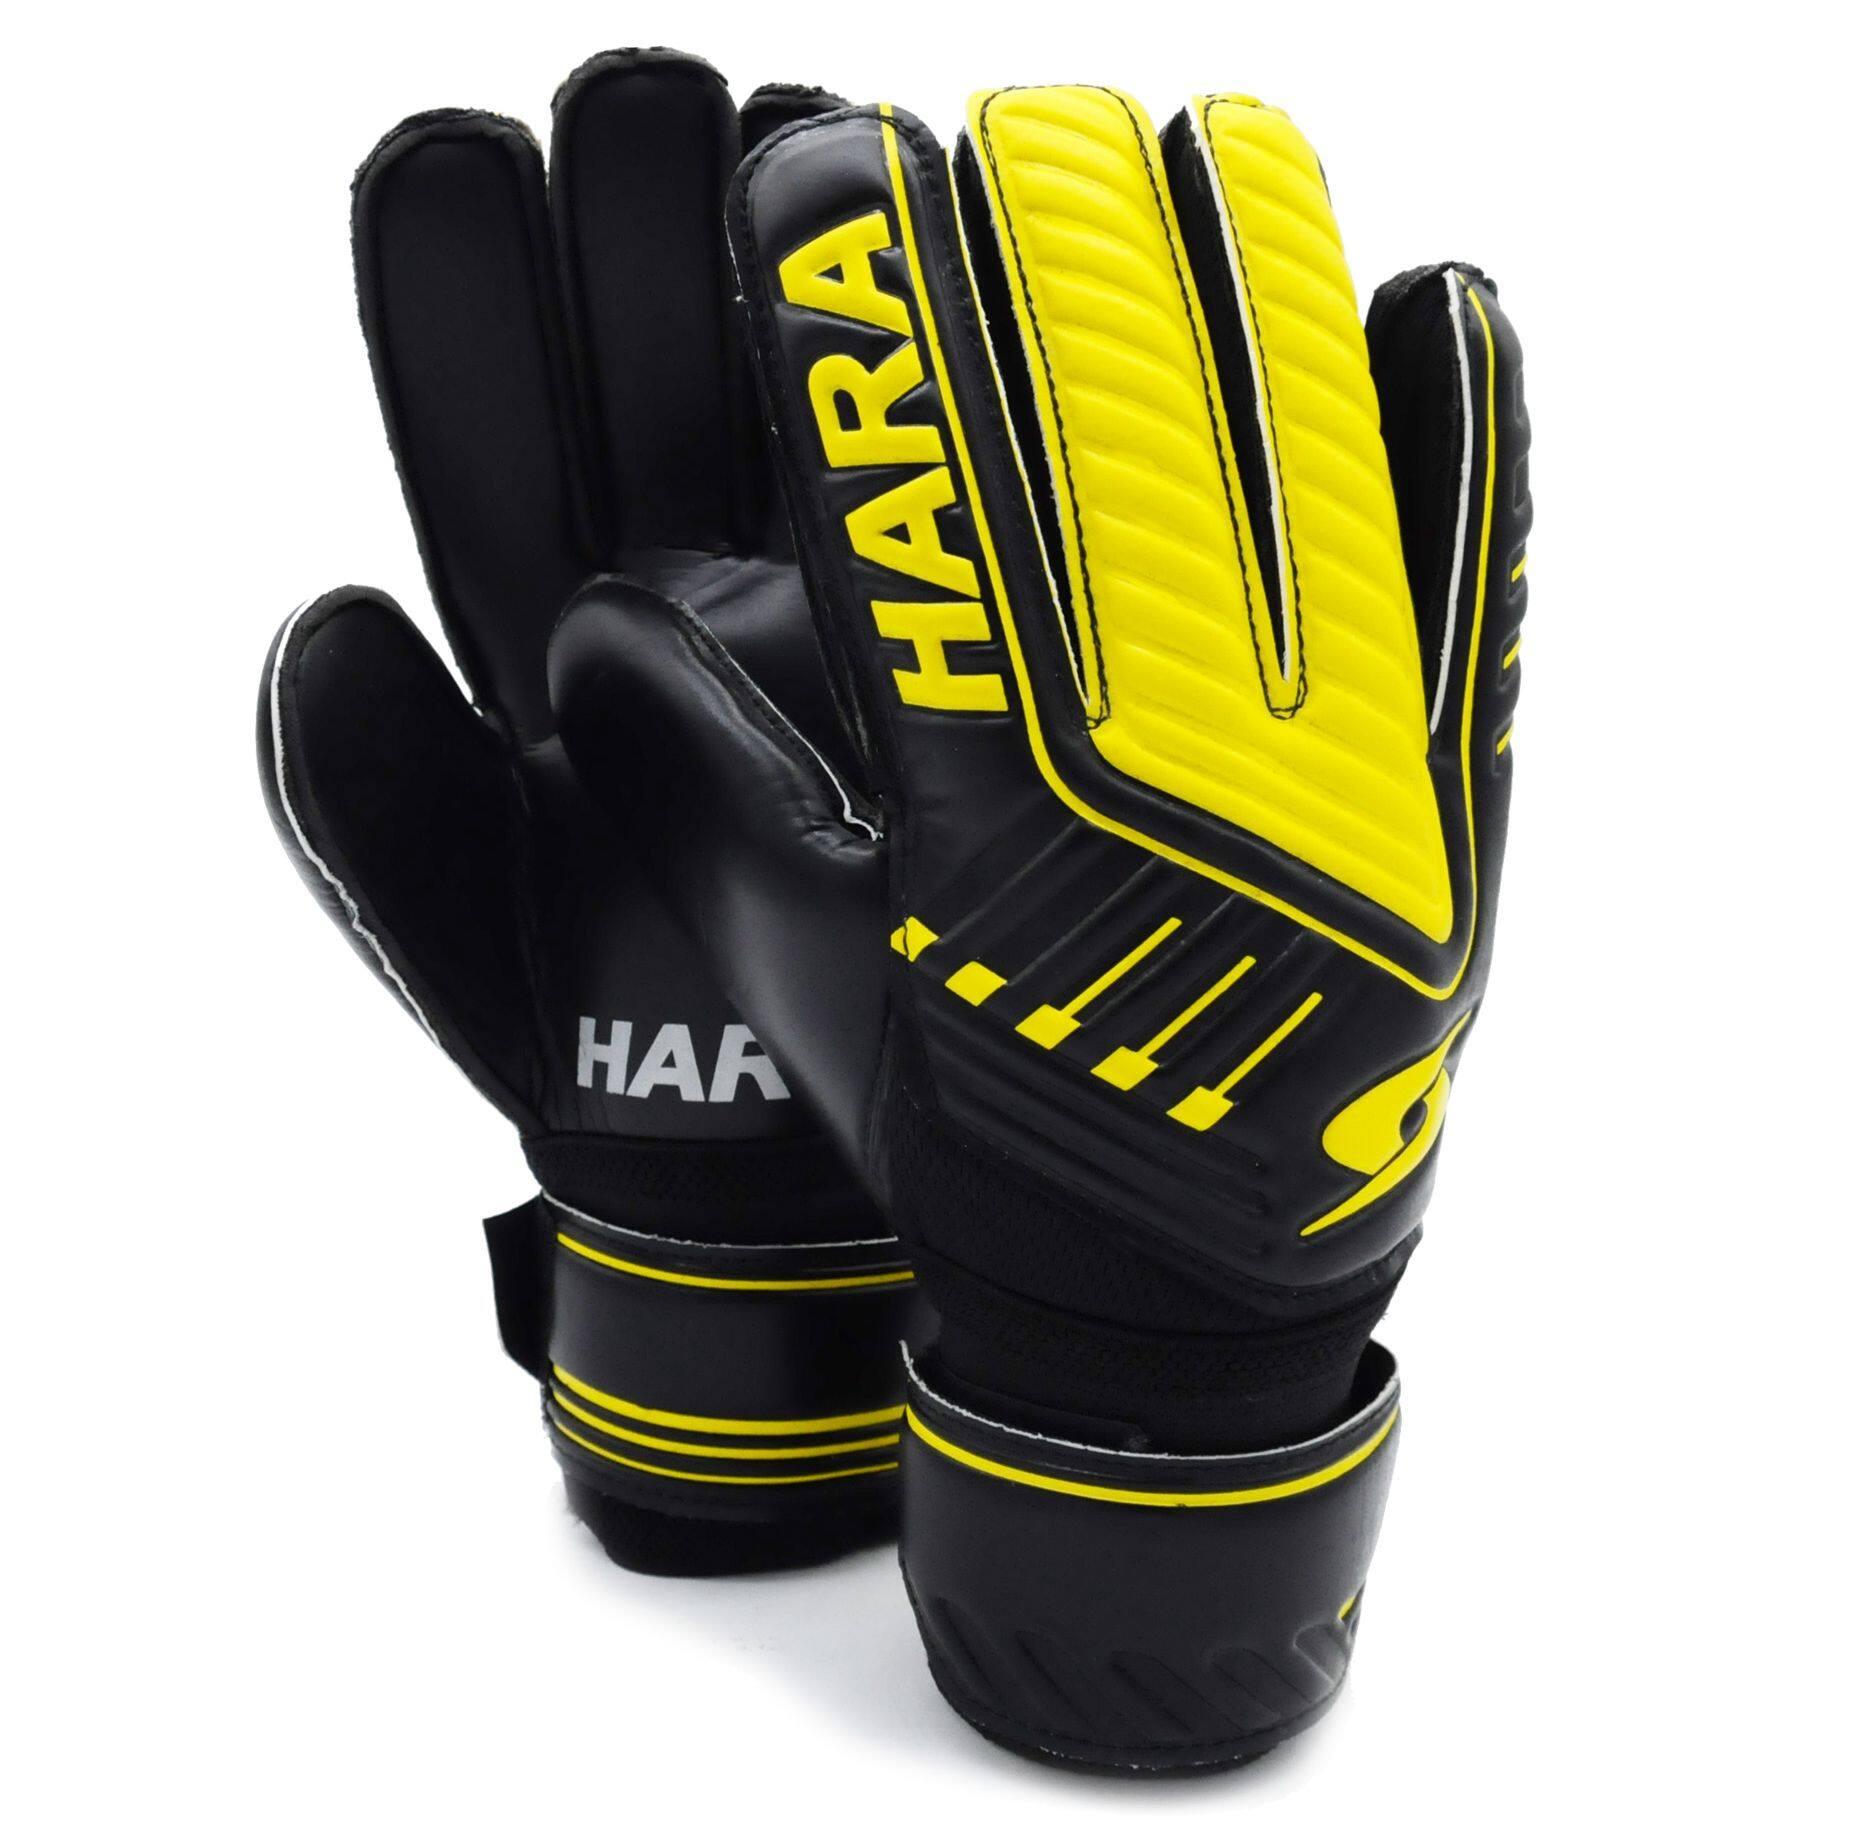 Hara Sports ถุงมือผู้รักษาประตู มีฟิงเกอร์เซฟ ถุงมือฟุตบอล สีดำ-เหลือง.